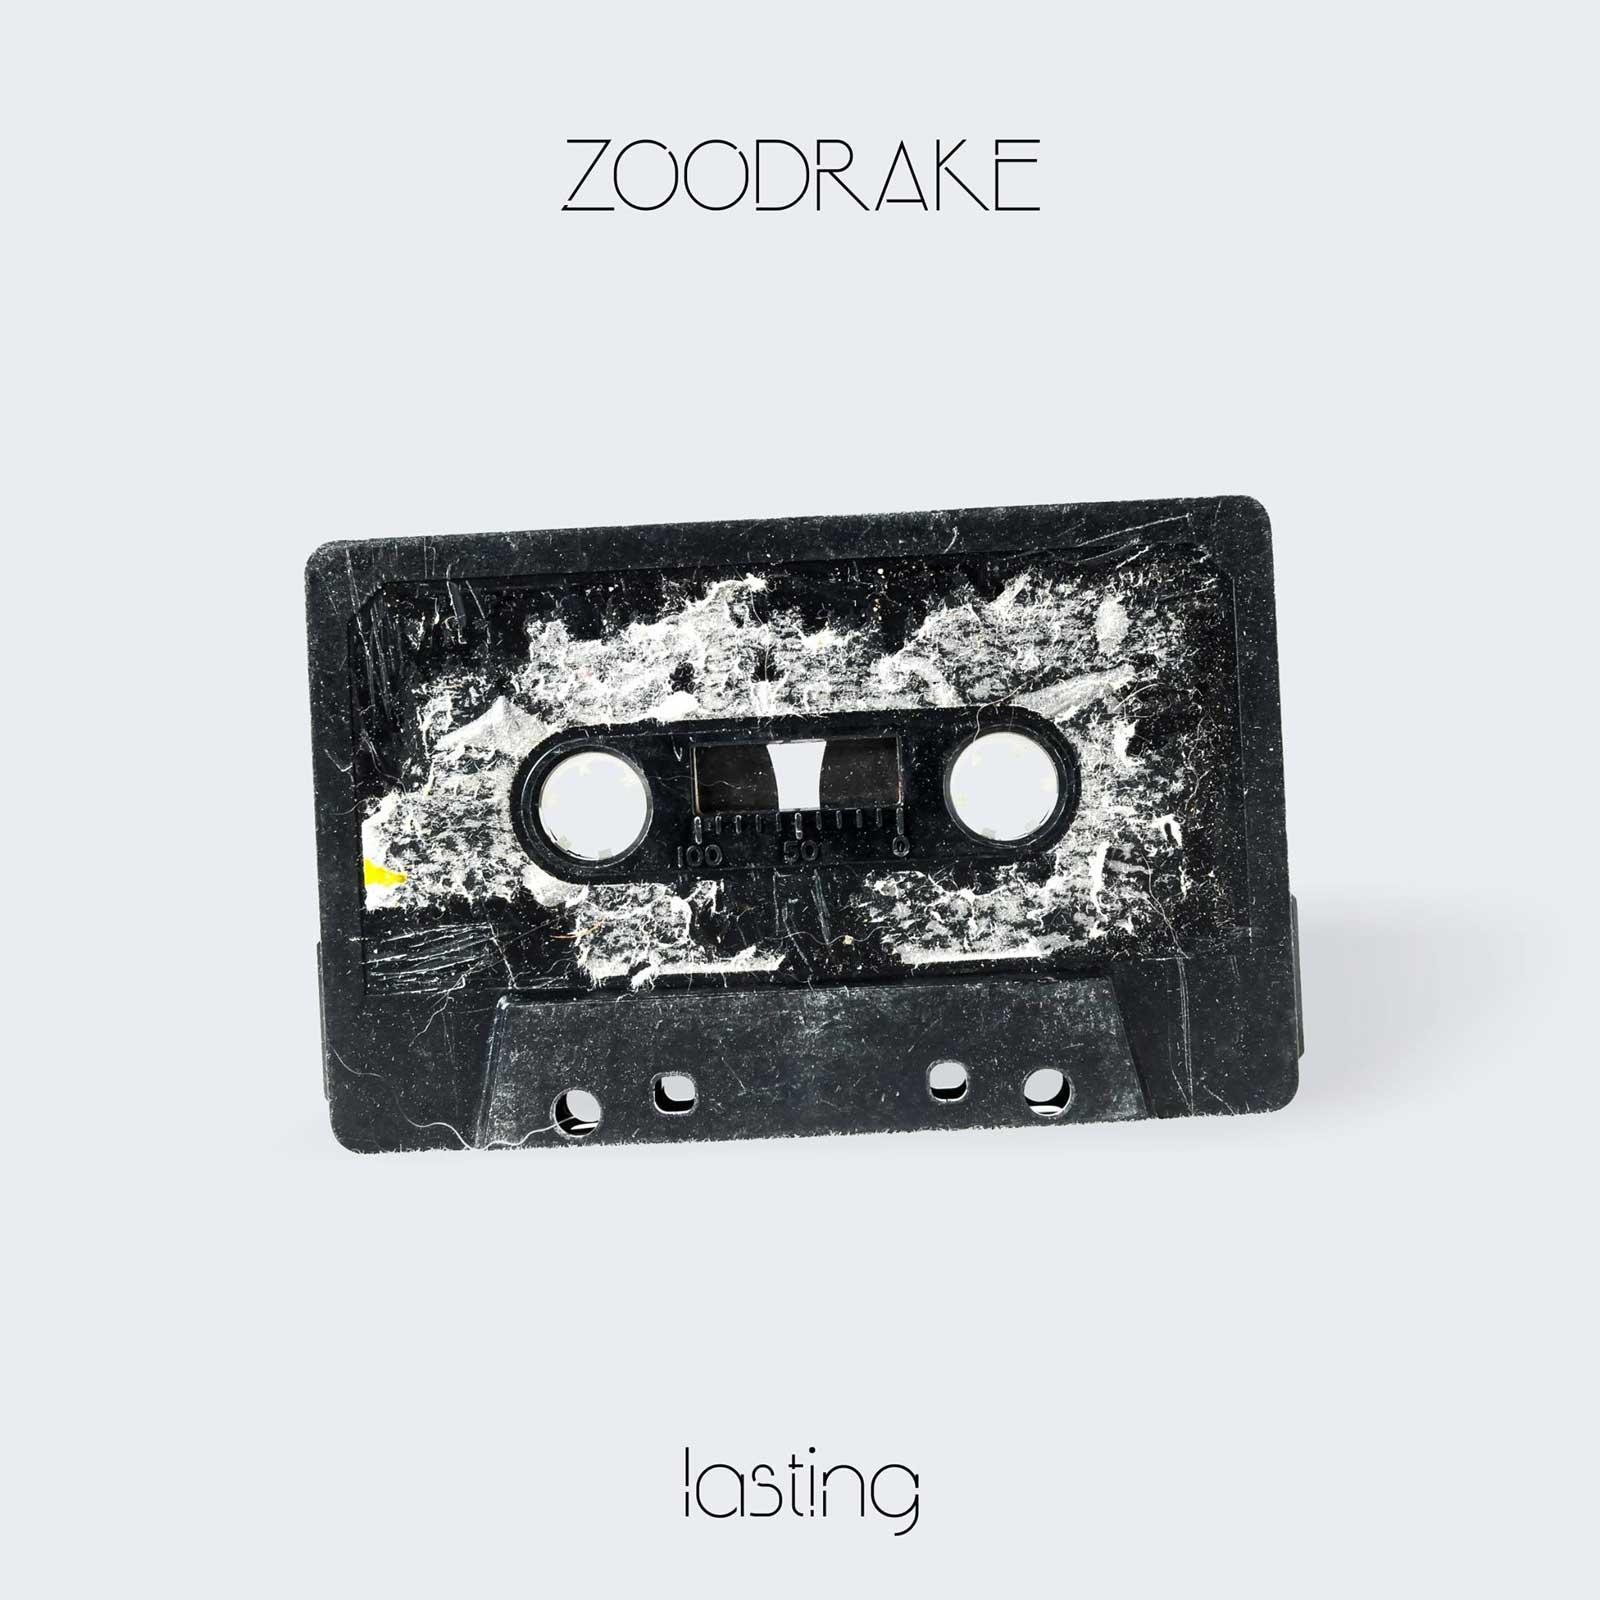 Zoodrake - Lasting - Zoodrake - Lasting